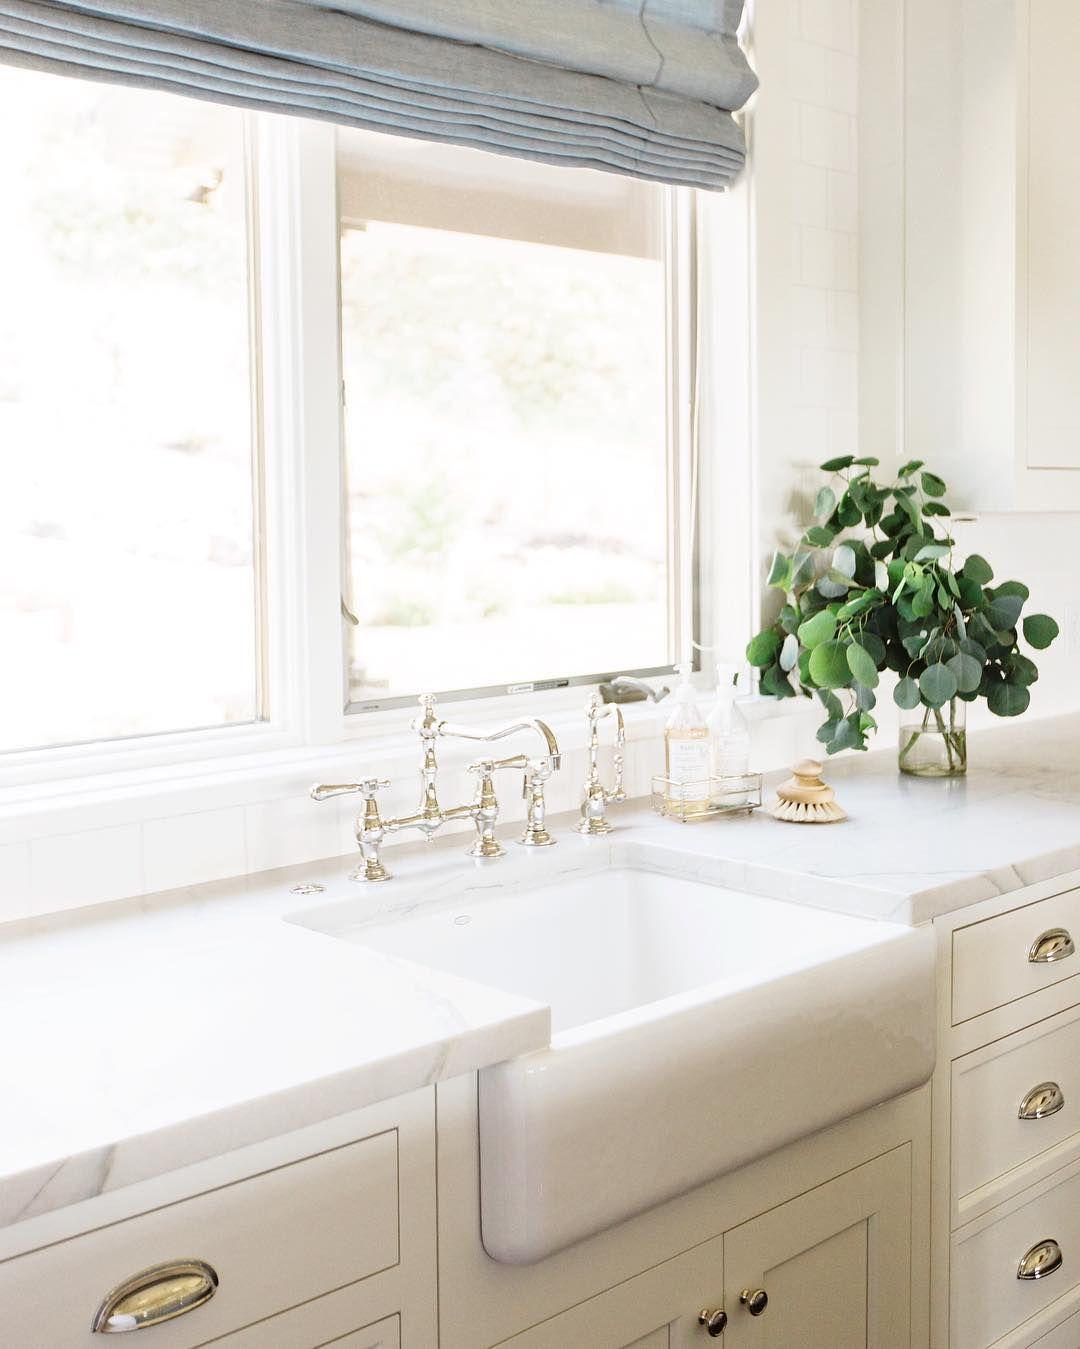 Bright white kitchen + marble countertops www.studio